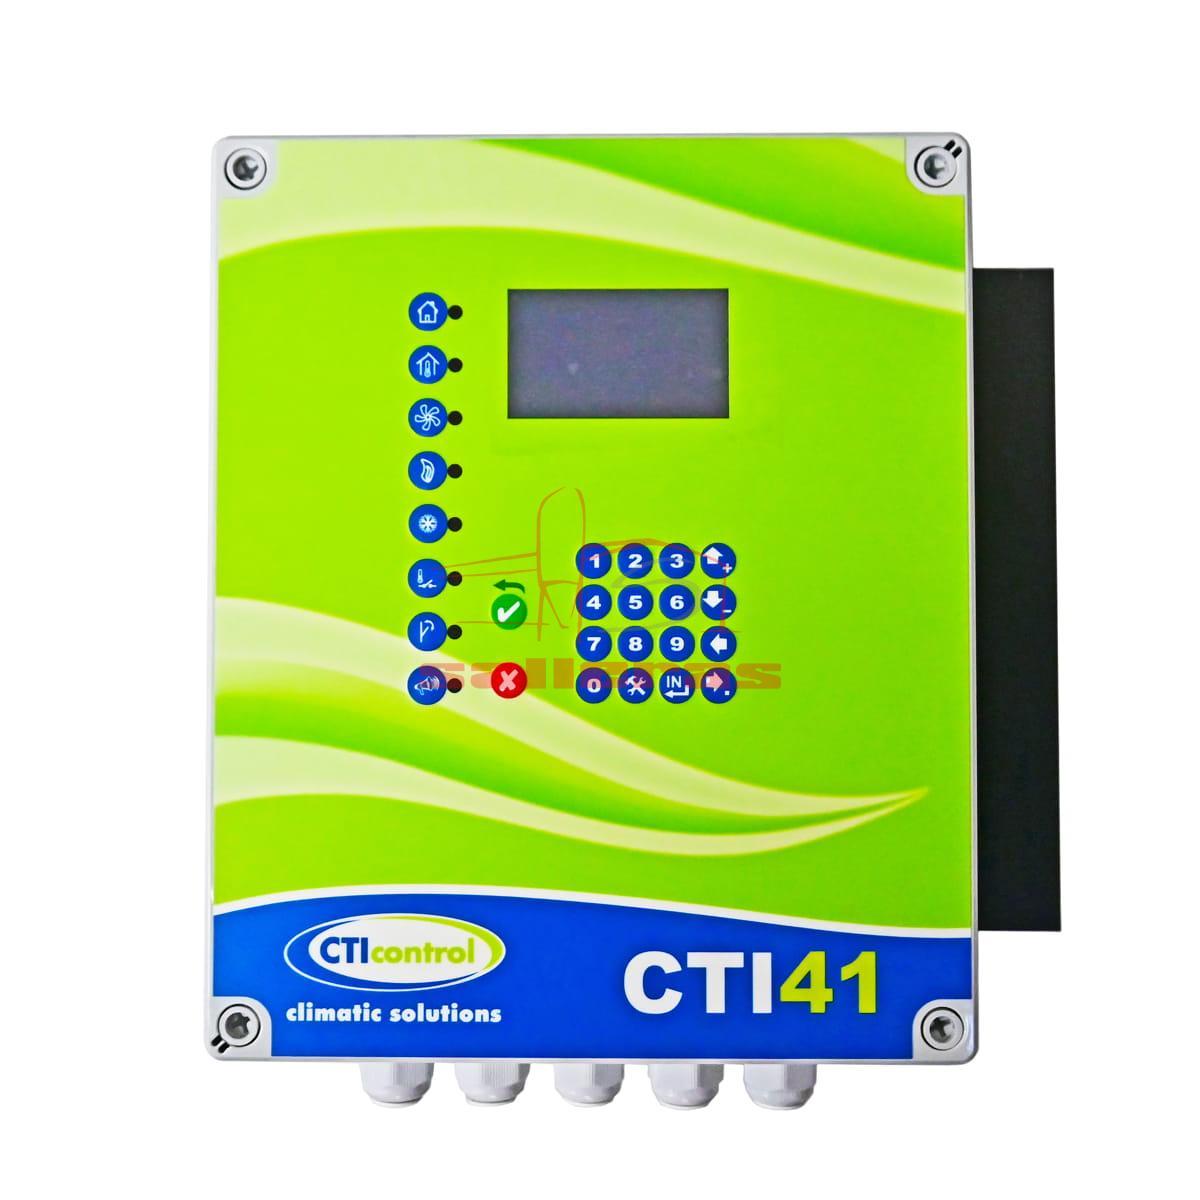 Regulador cti 41 25a verde